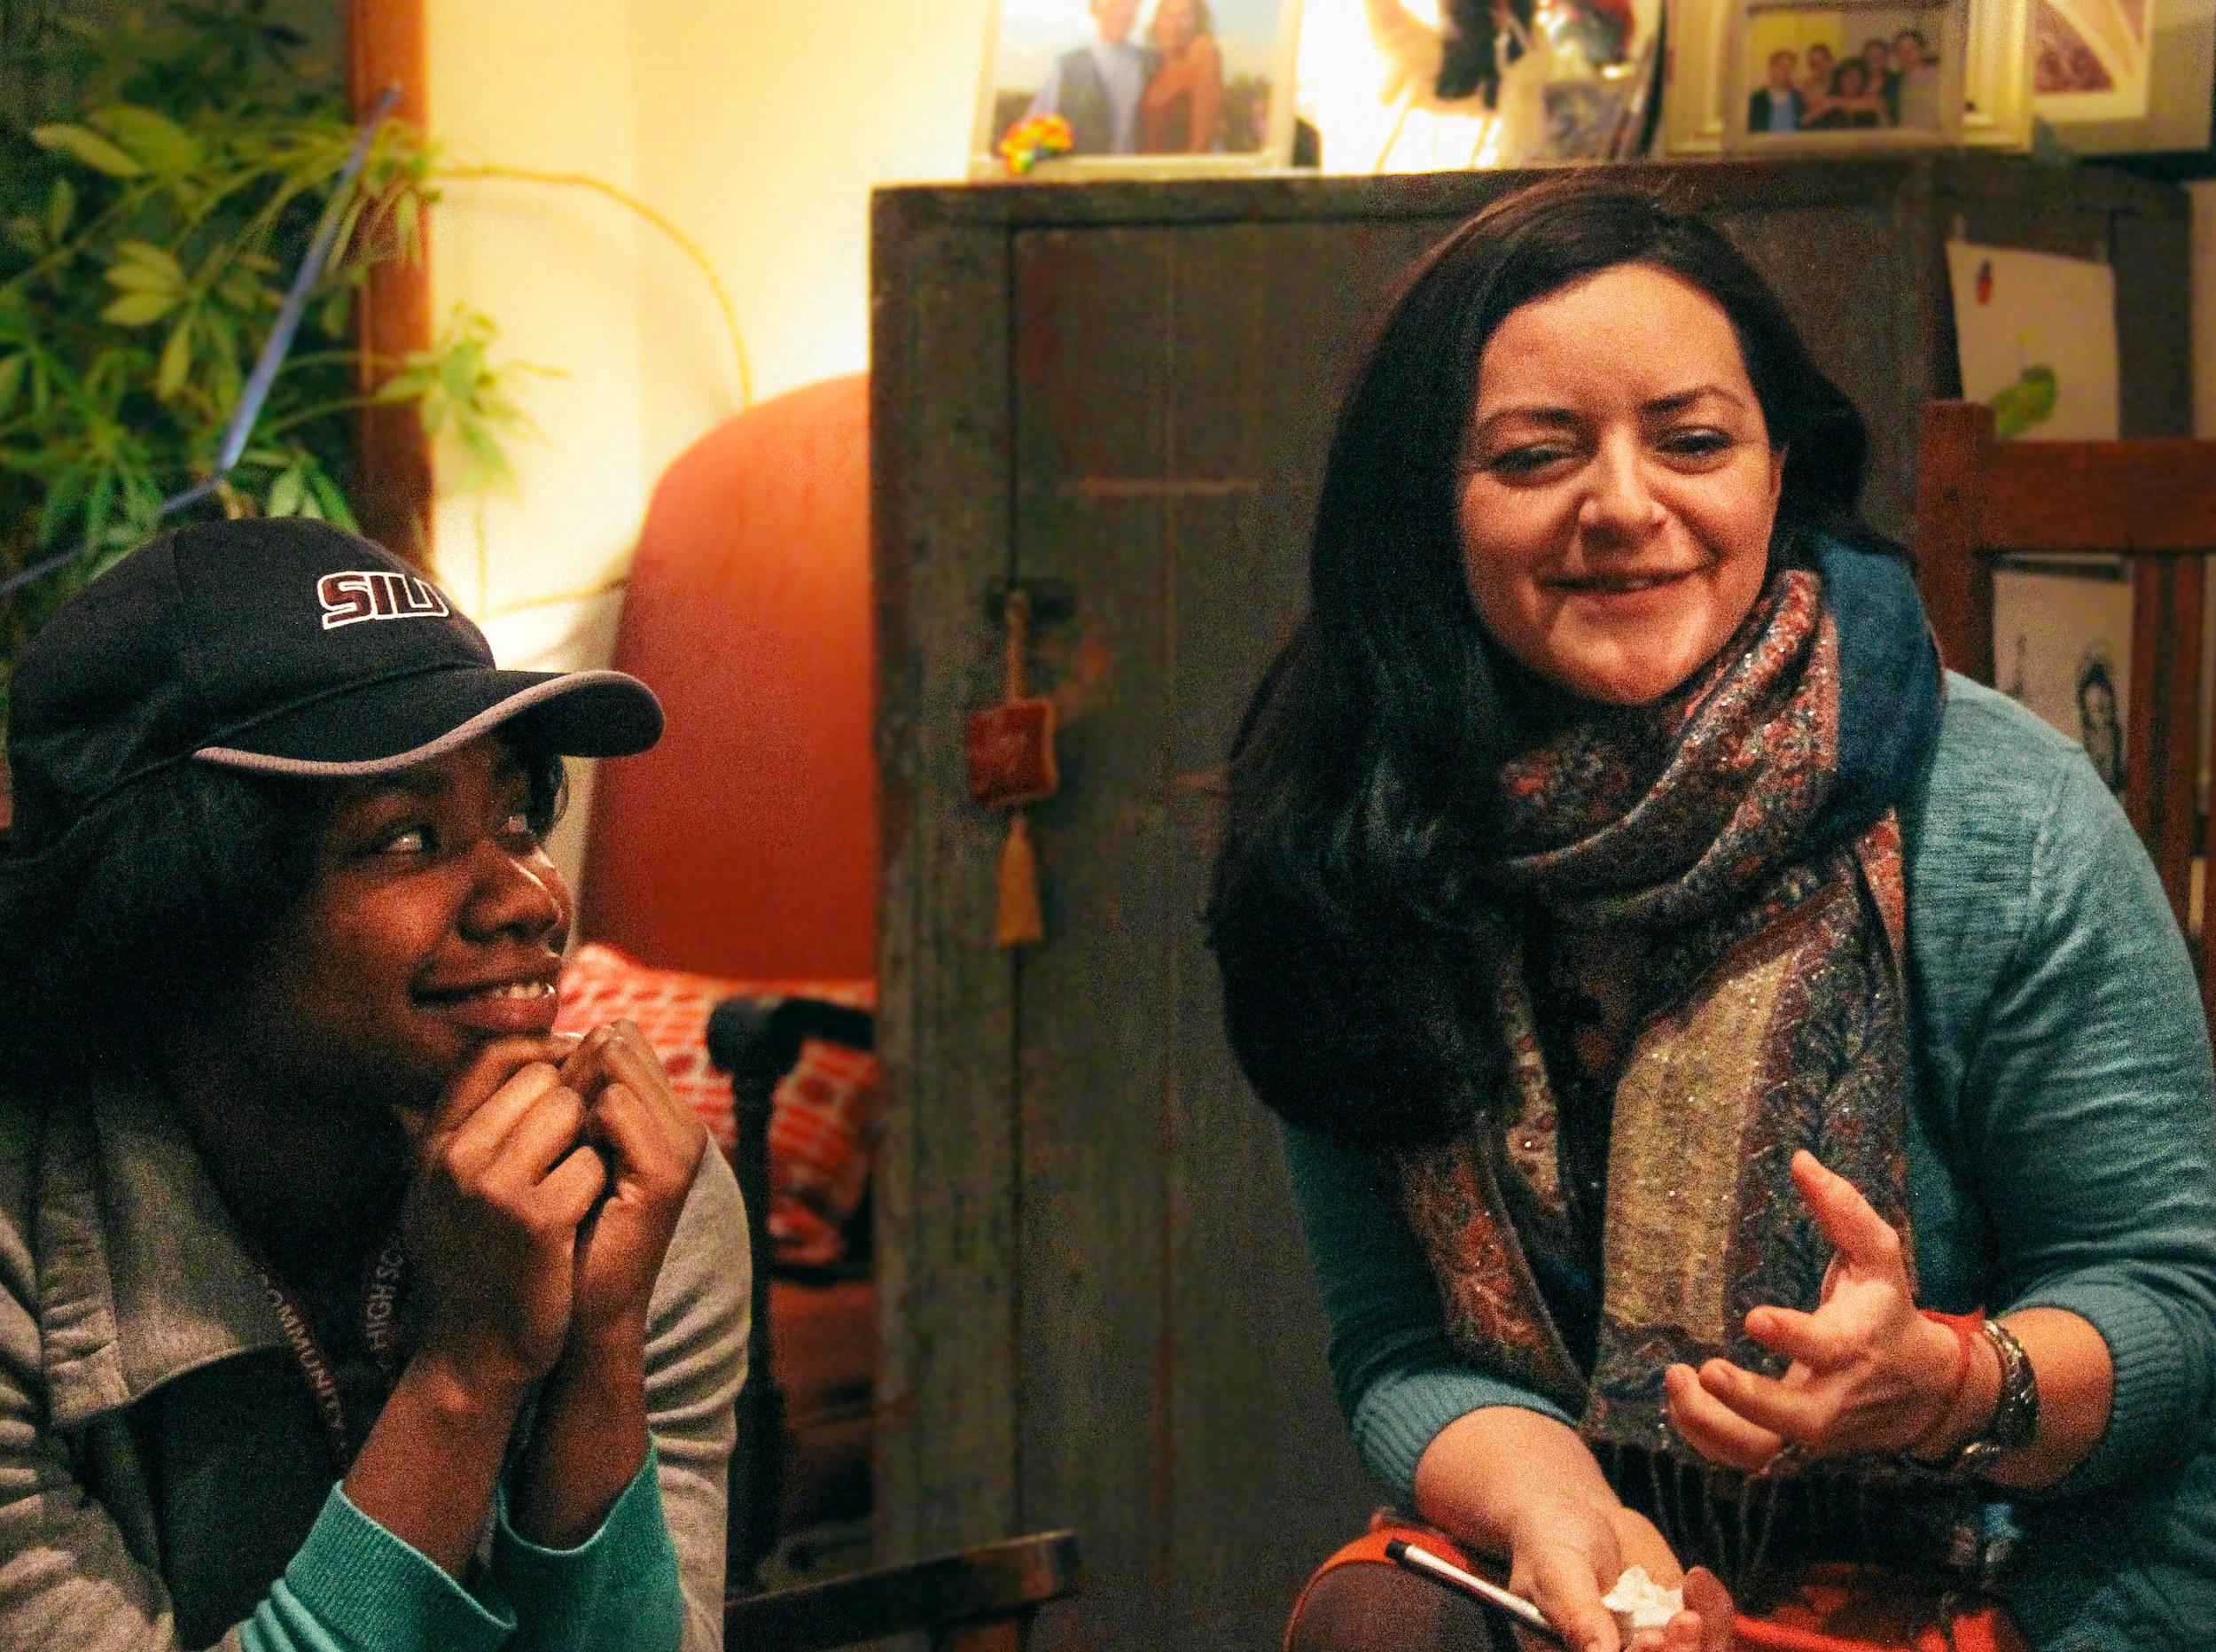 Peace Fellow Briana Johnson (left) listening to Peace Activist  Lau Ramirez   (right)share her story.